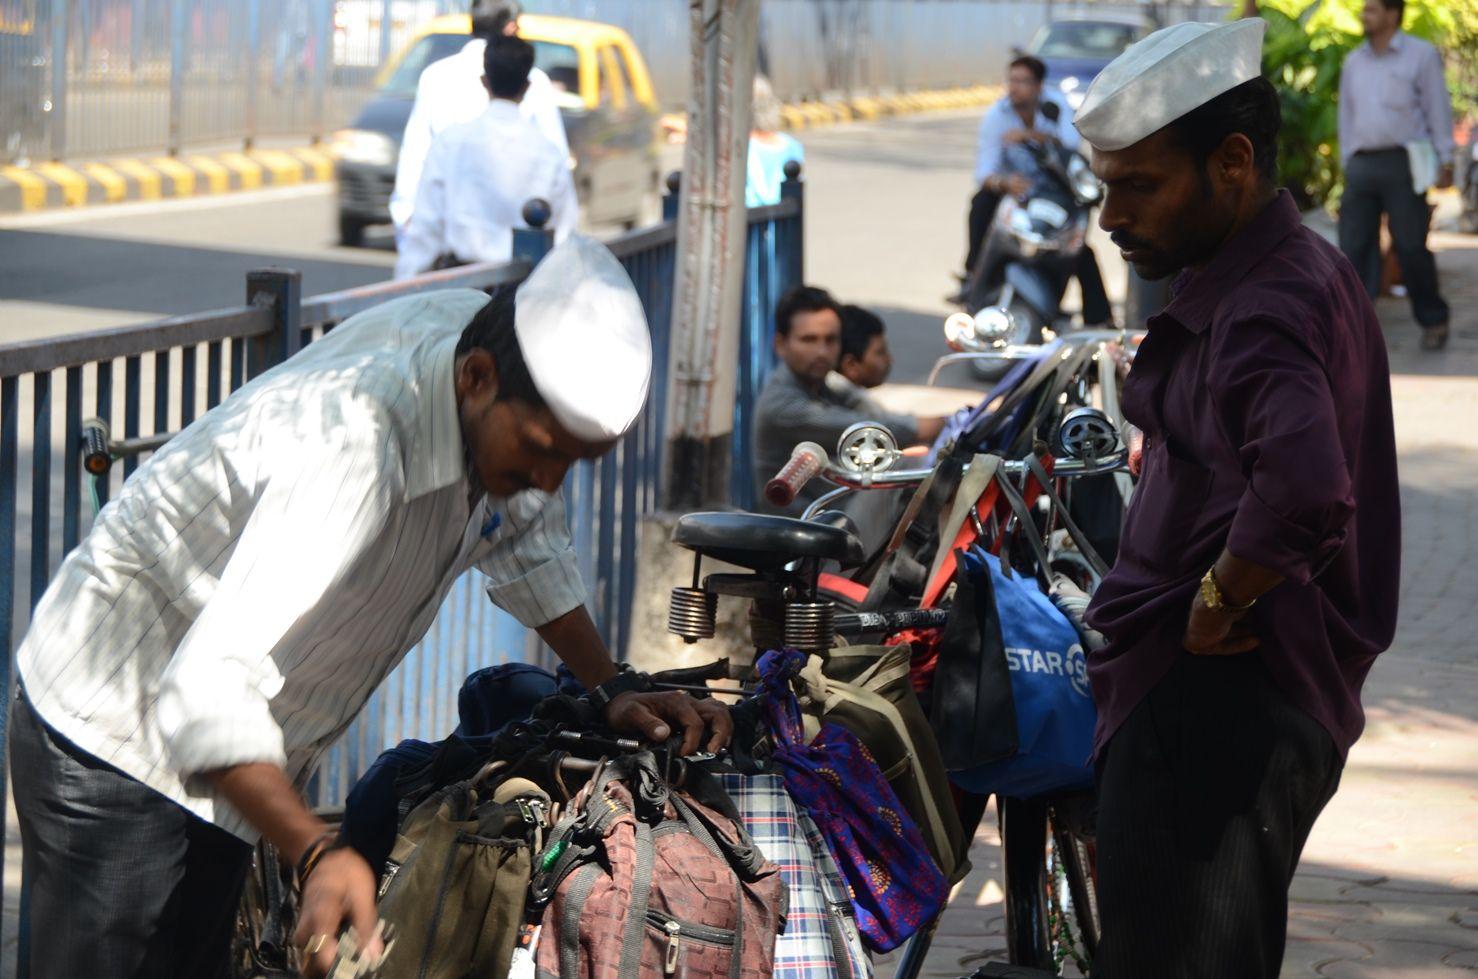 The Dabbawalas hard at work near Churchgate Station, Mumbai, India